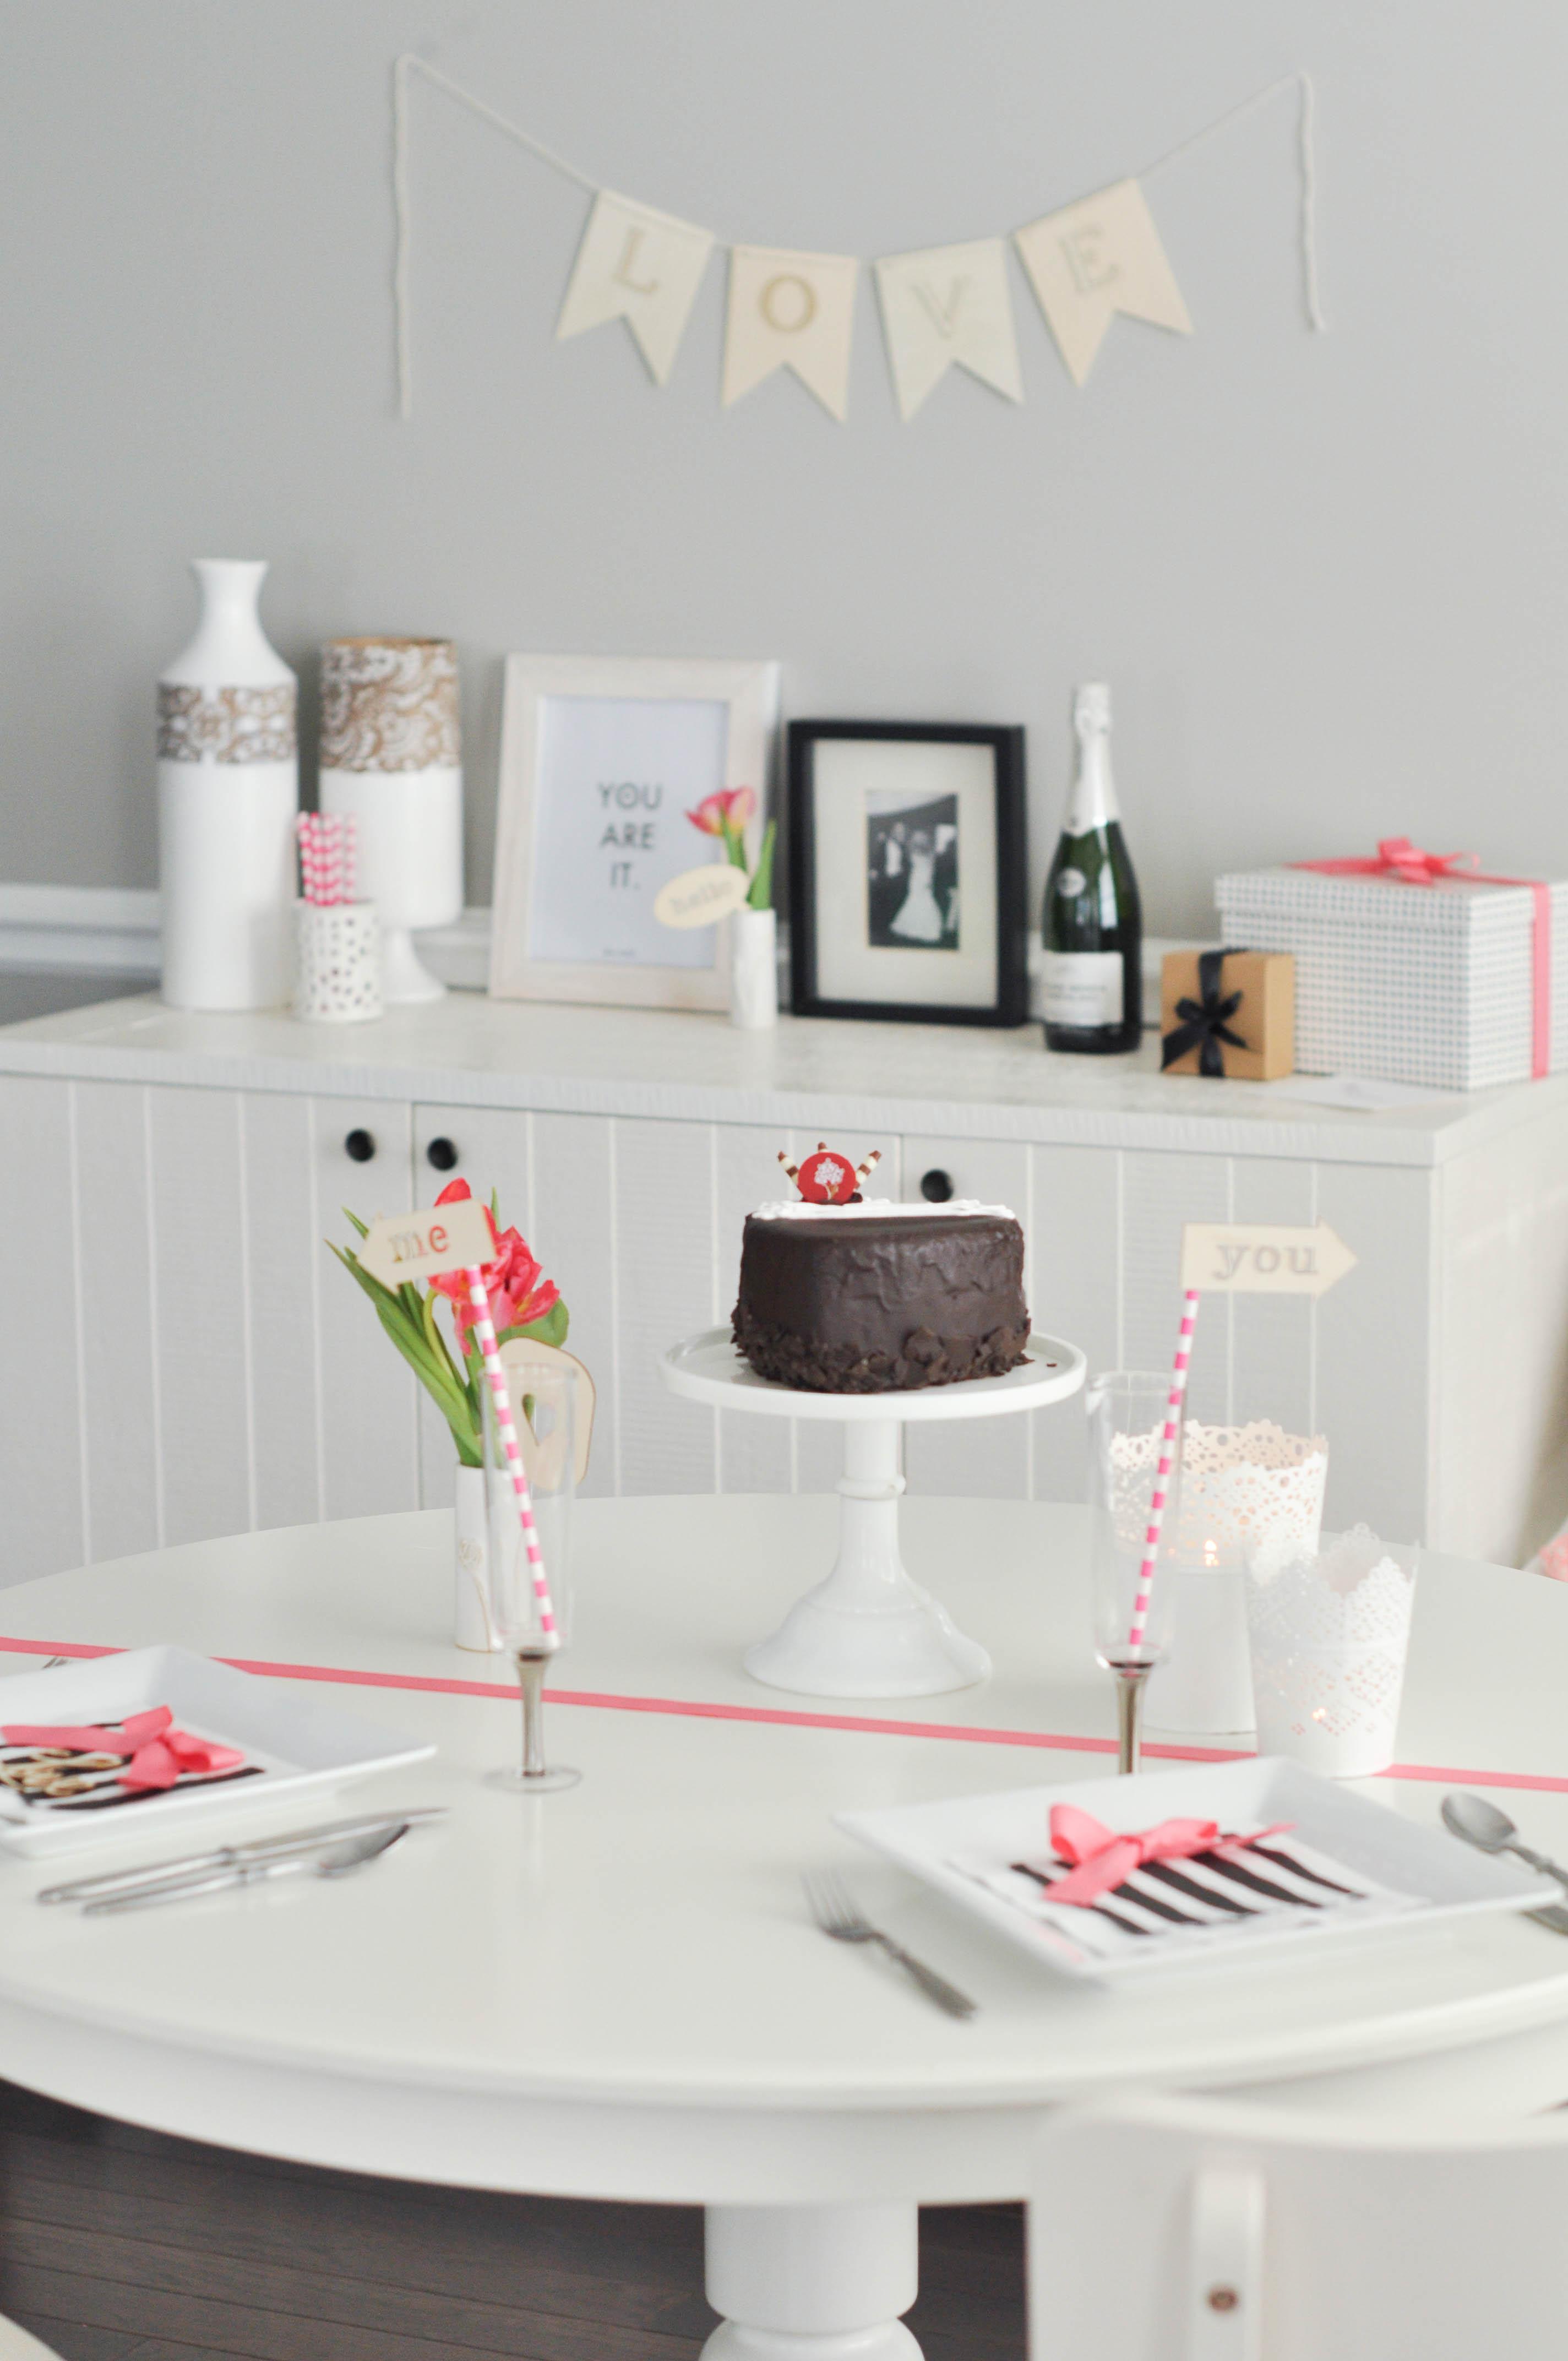 valentines-day-dinining-decoration-ideas-5